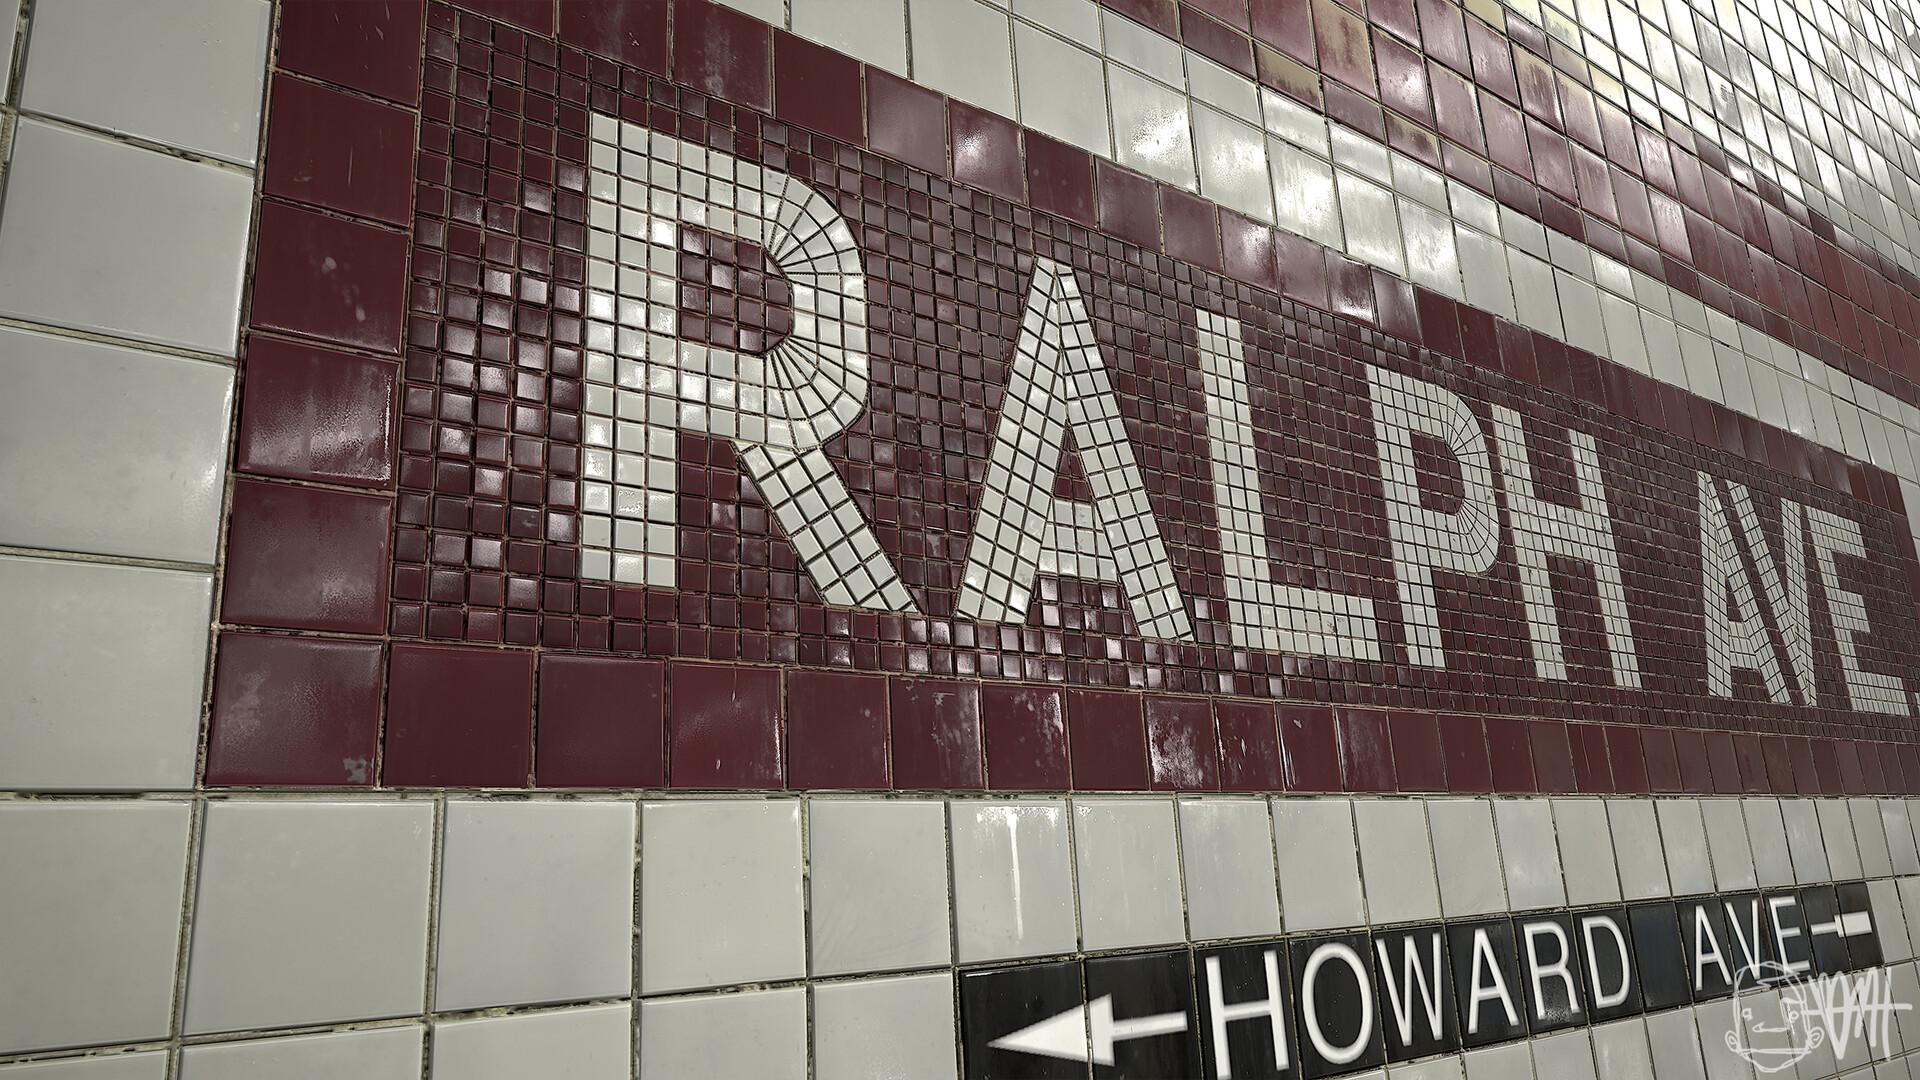 Brett marshall tucker subway tile marmoset detail